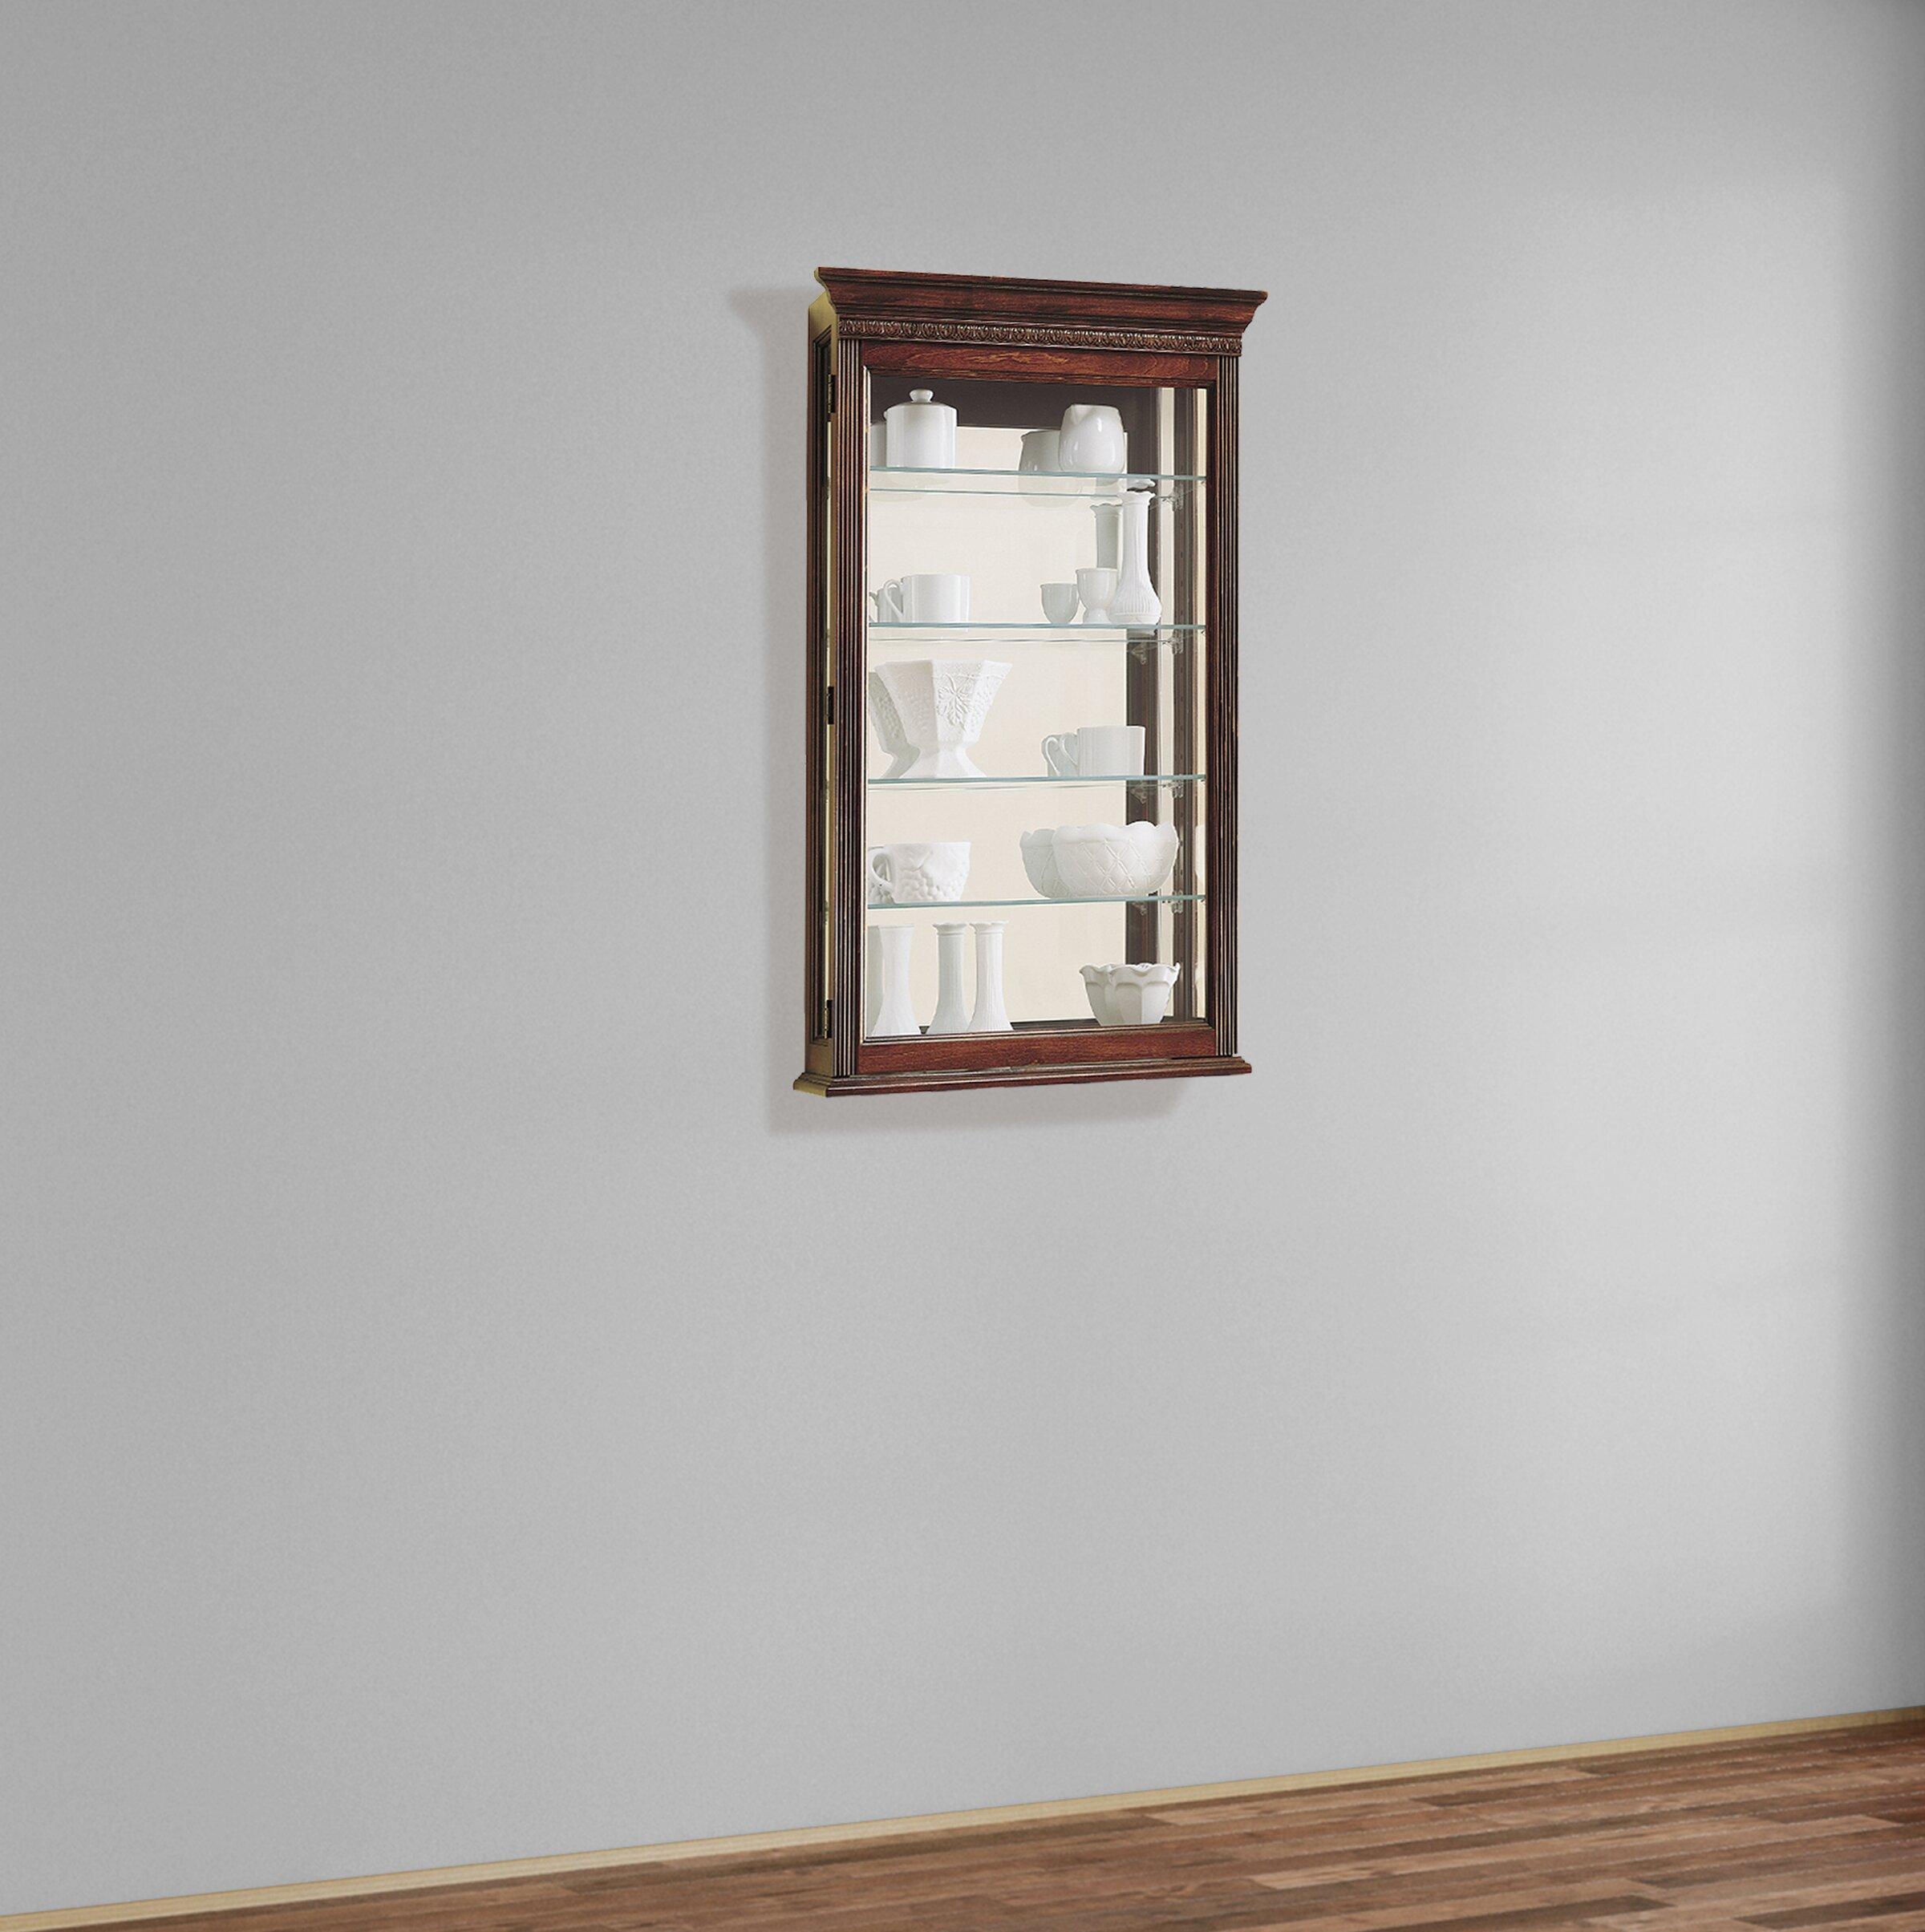 Carmelita Wall Mounted Curio Cabinet